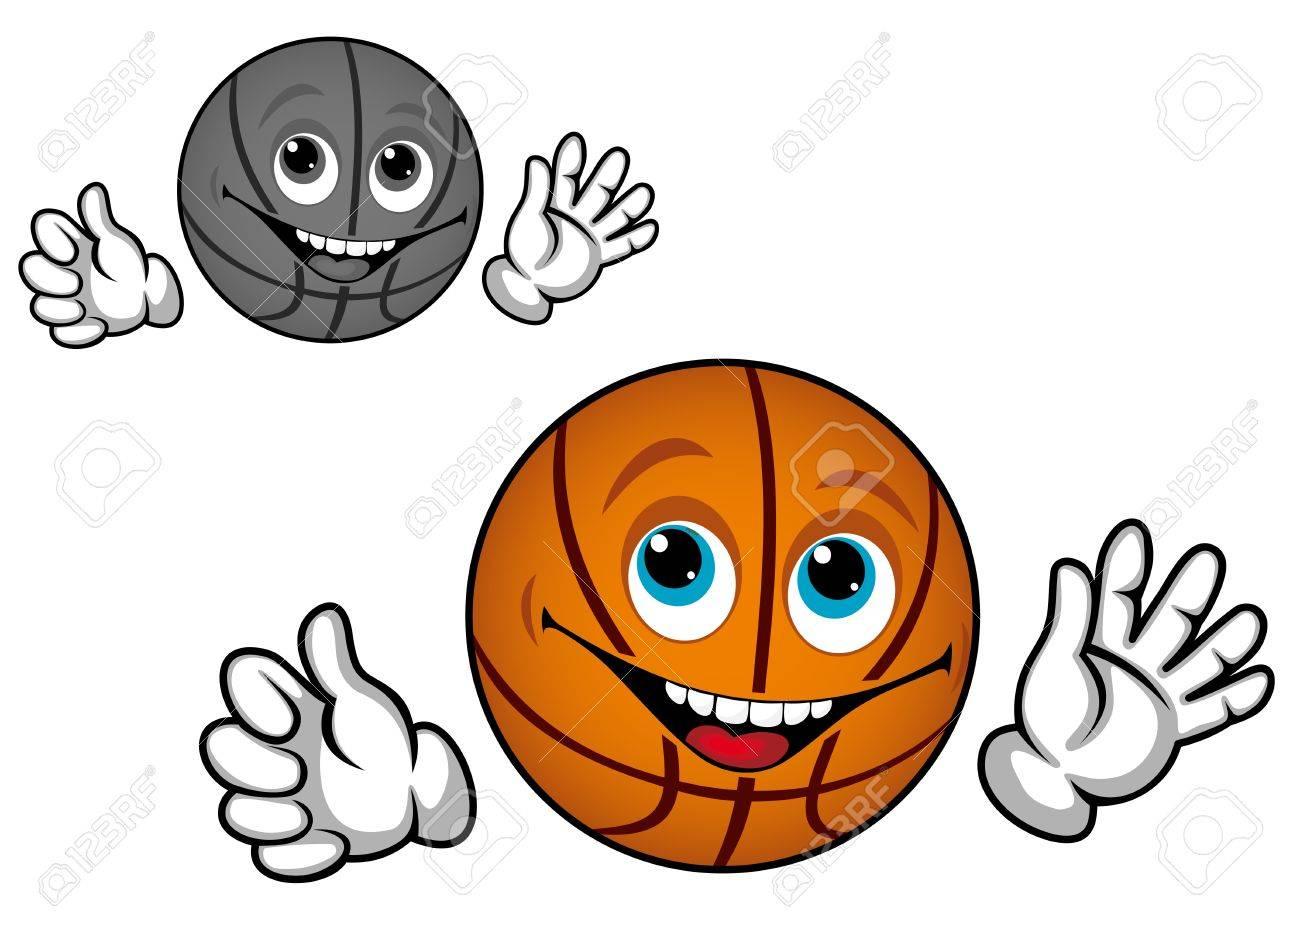 Basketball ball in cartoon style for sports design Stock Vector - 12465376